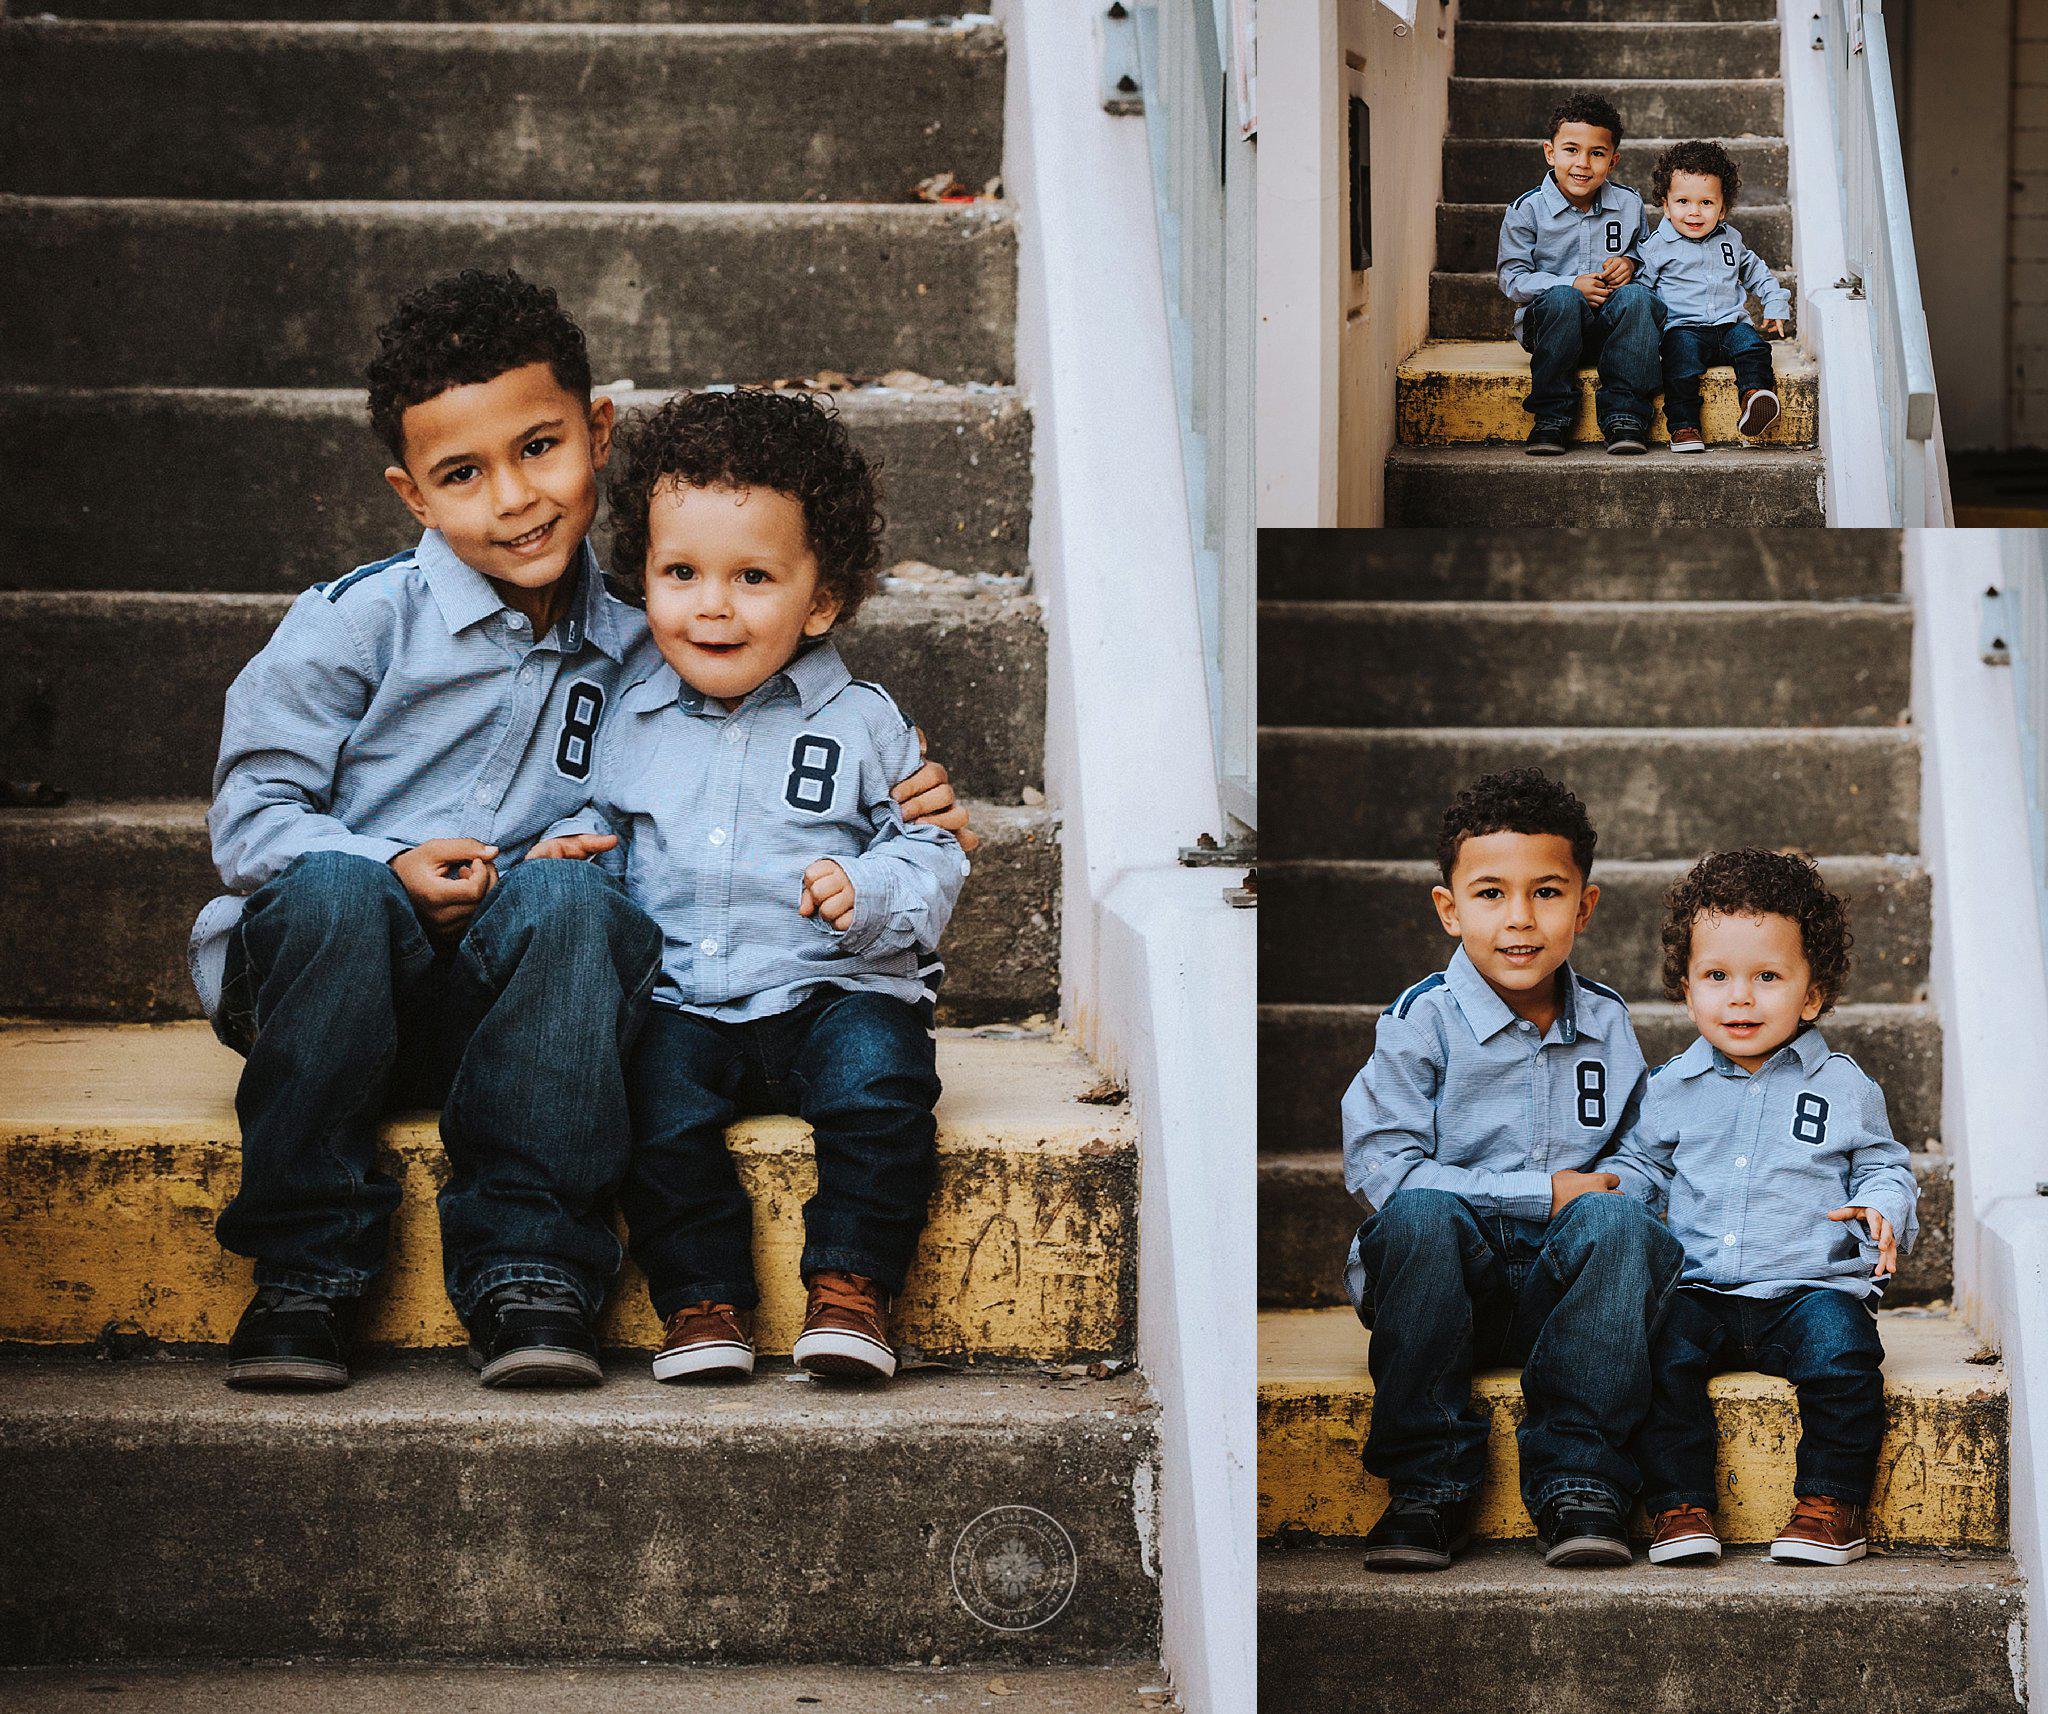 cute-young-boys-virginia-beach-photo-session-melissa-bliss-photography